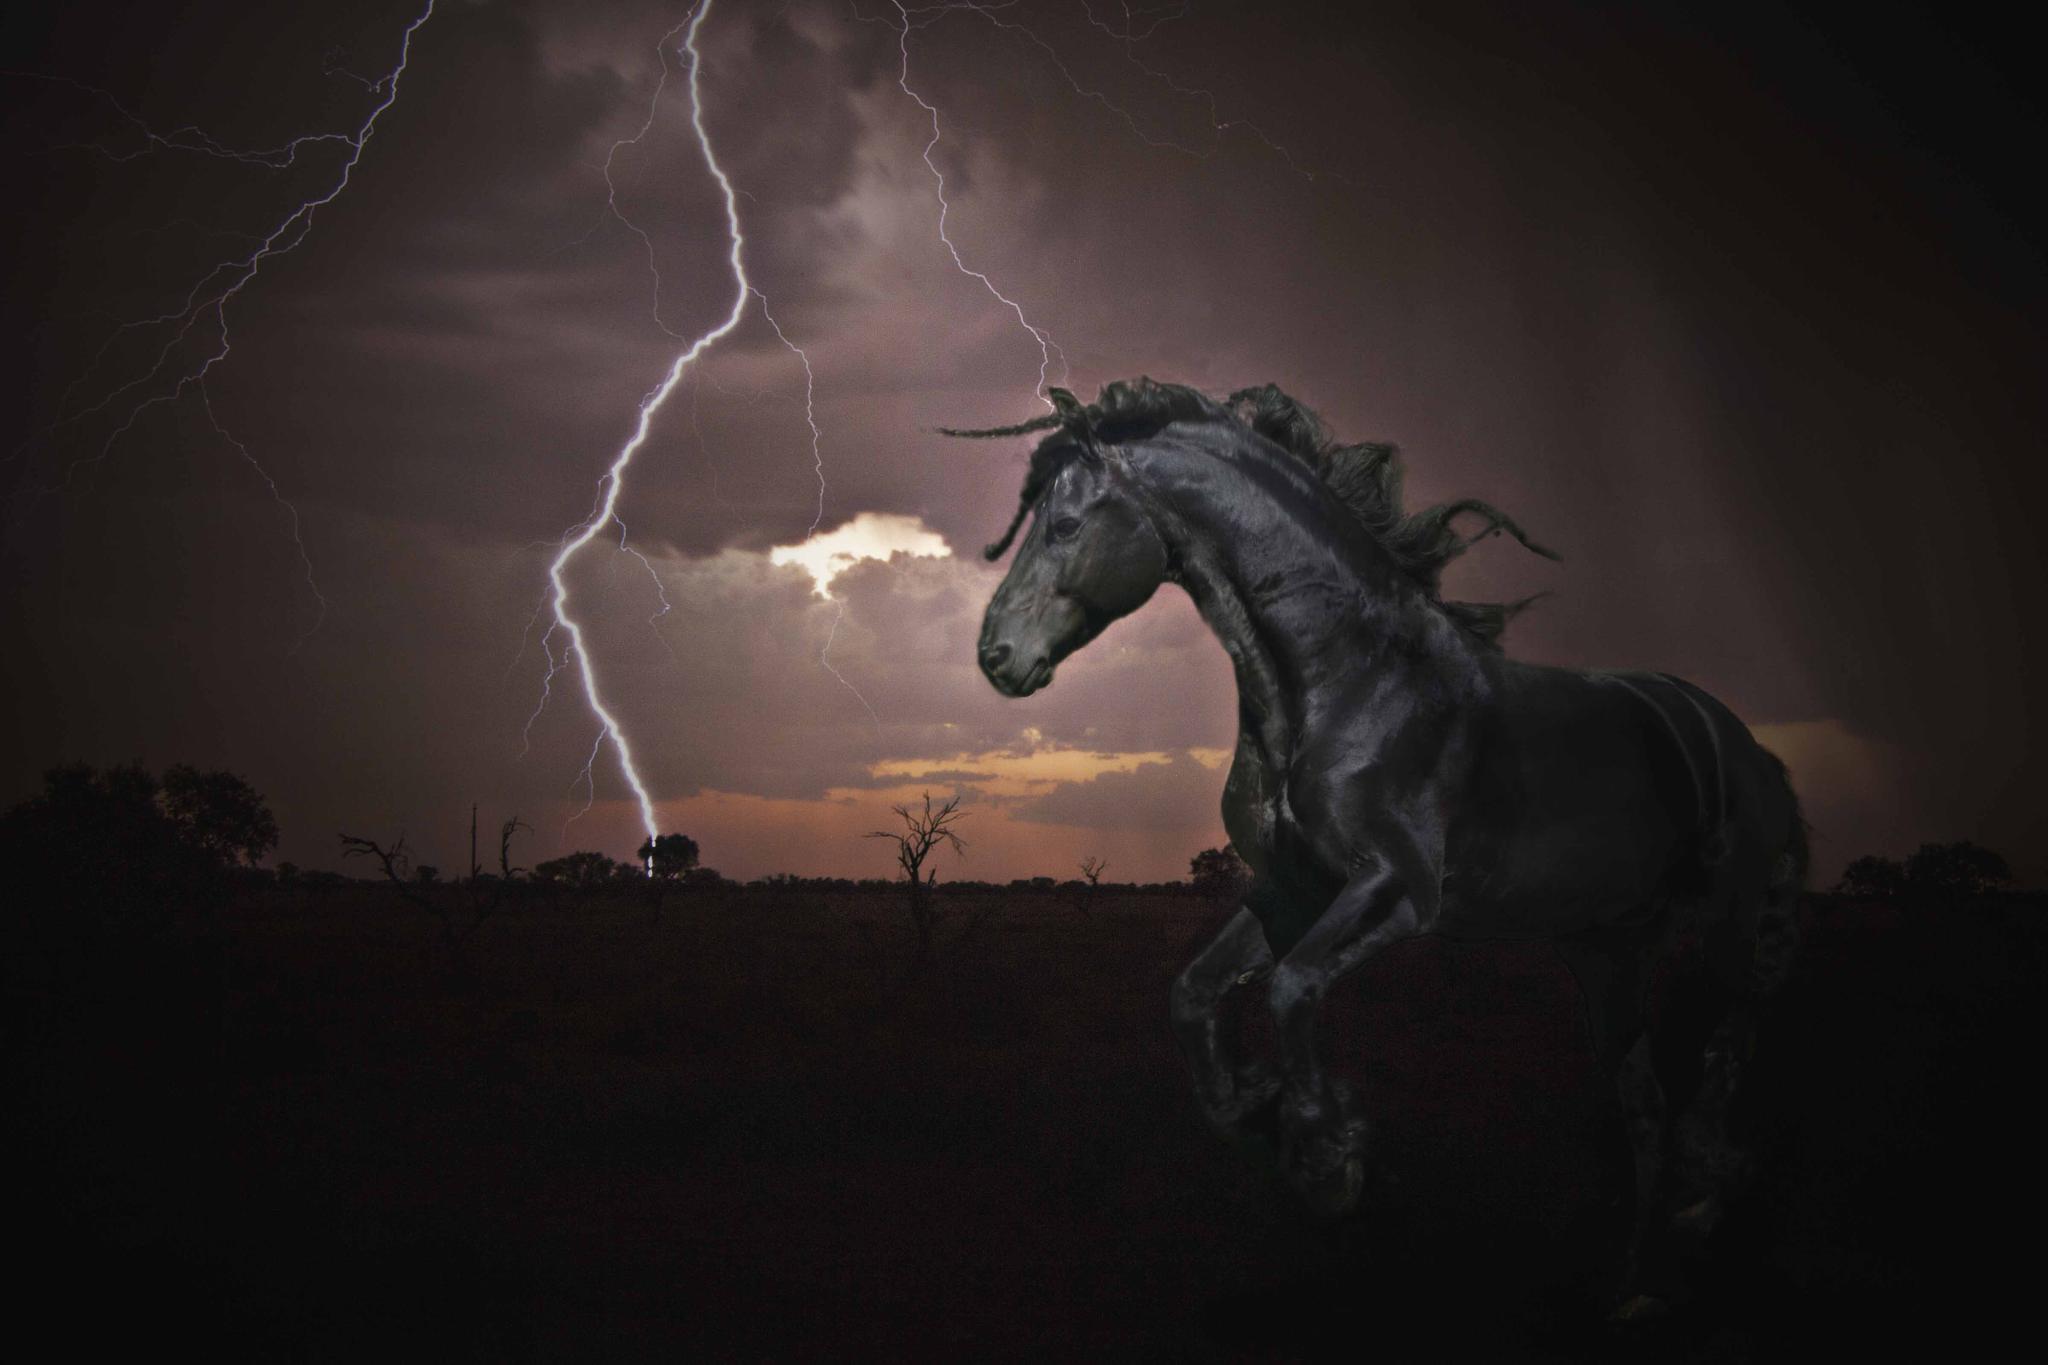 Friesan Storm by AlisonKekewichDuncan